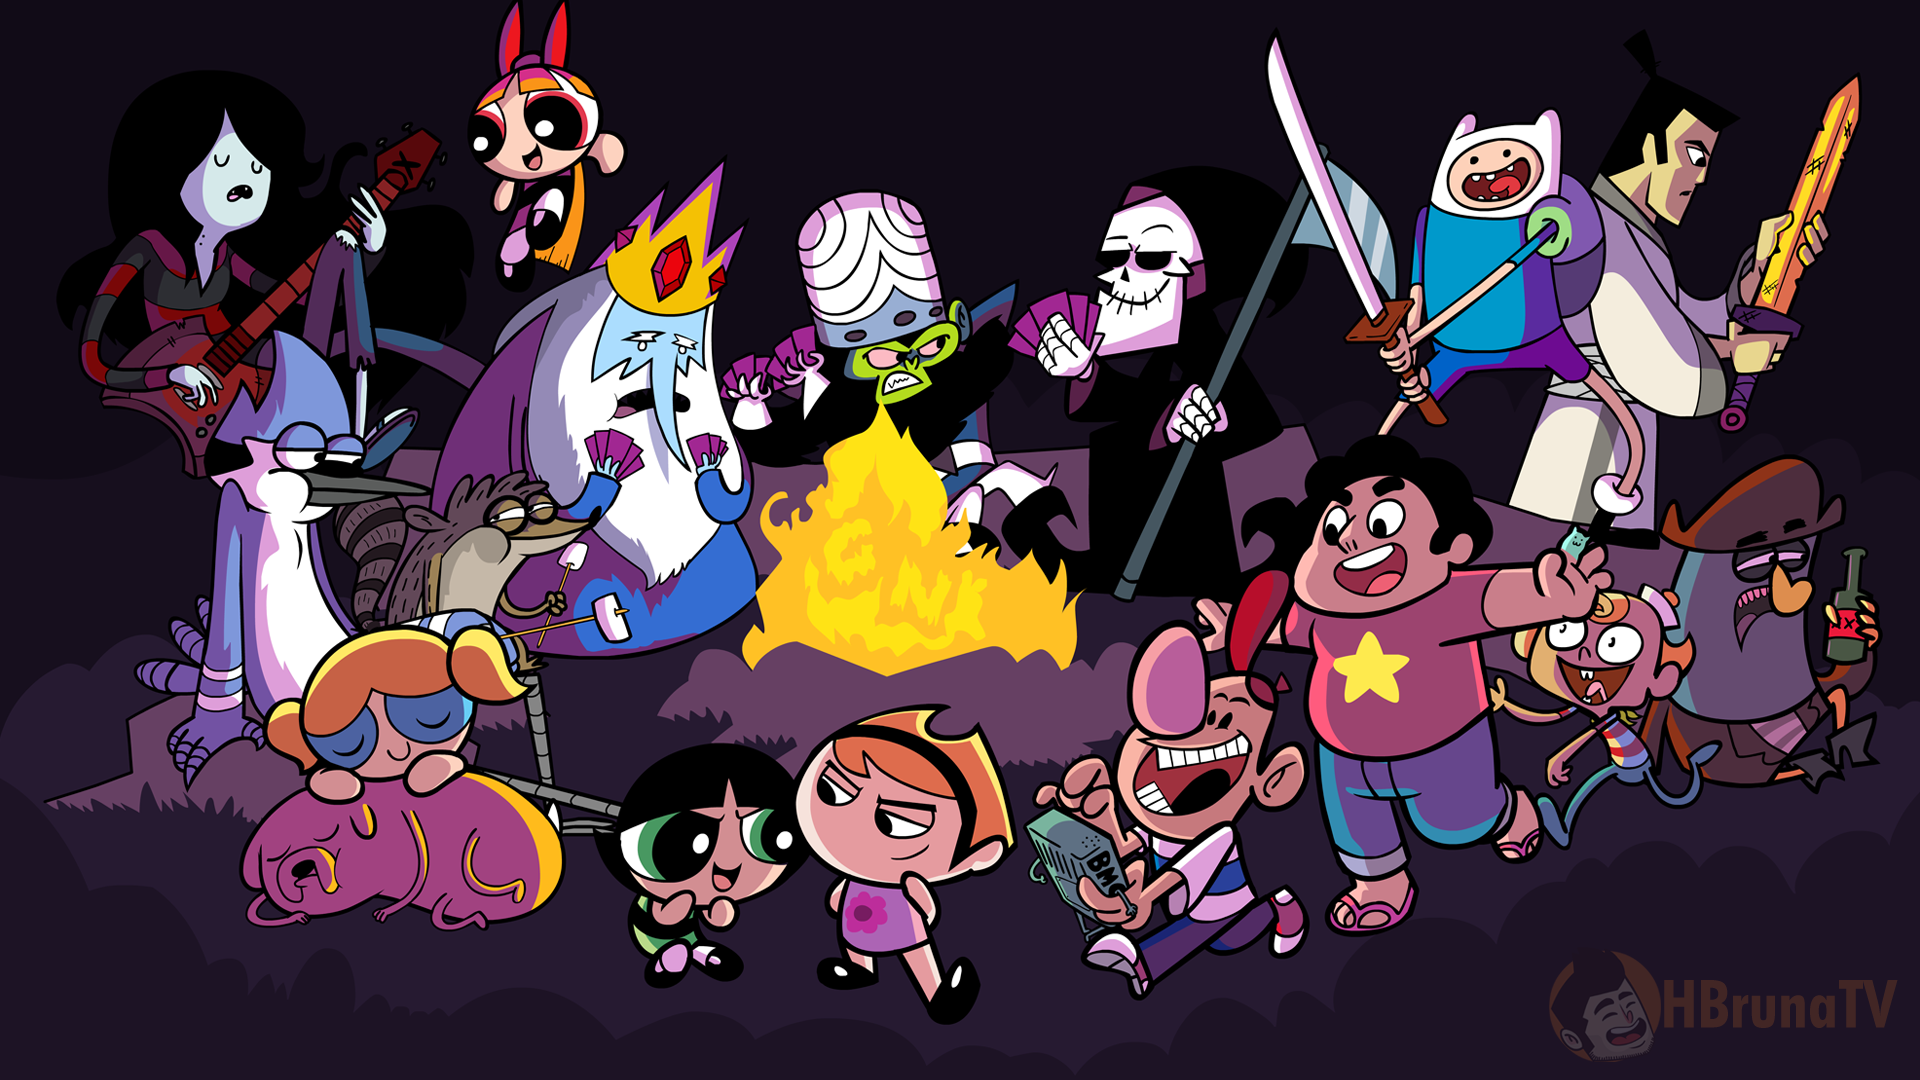 98 Cartoon Network Crossover Crisis Deck Building Game Ludopedia